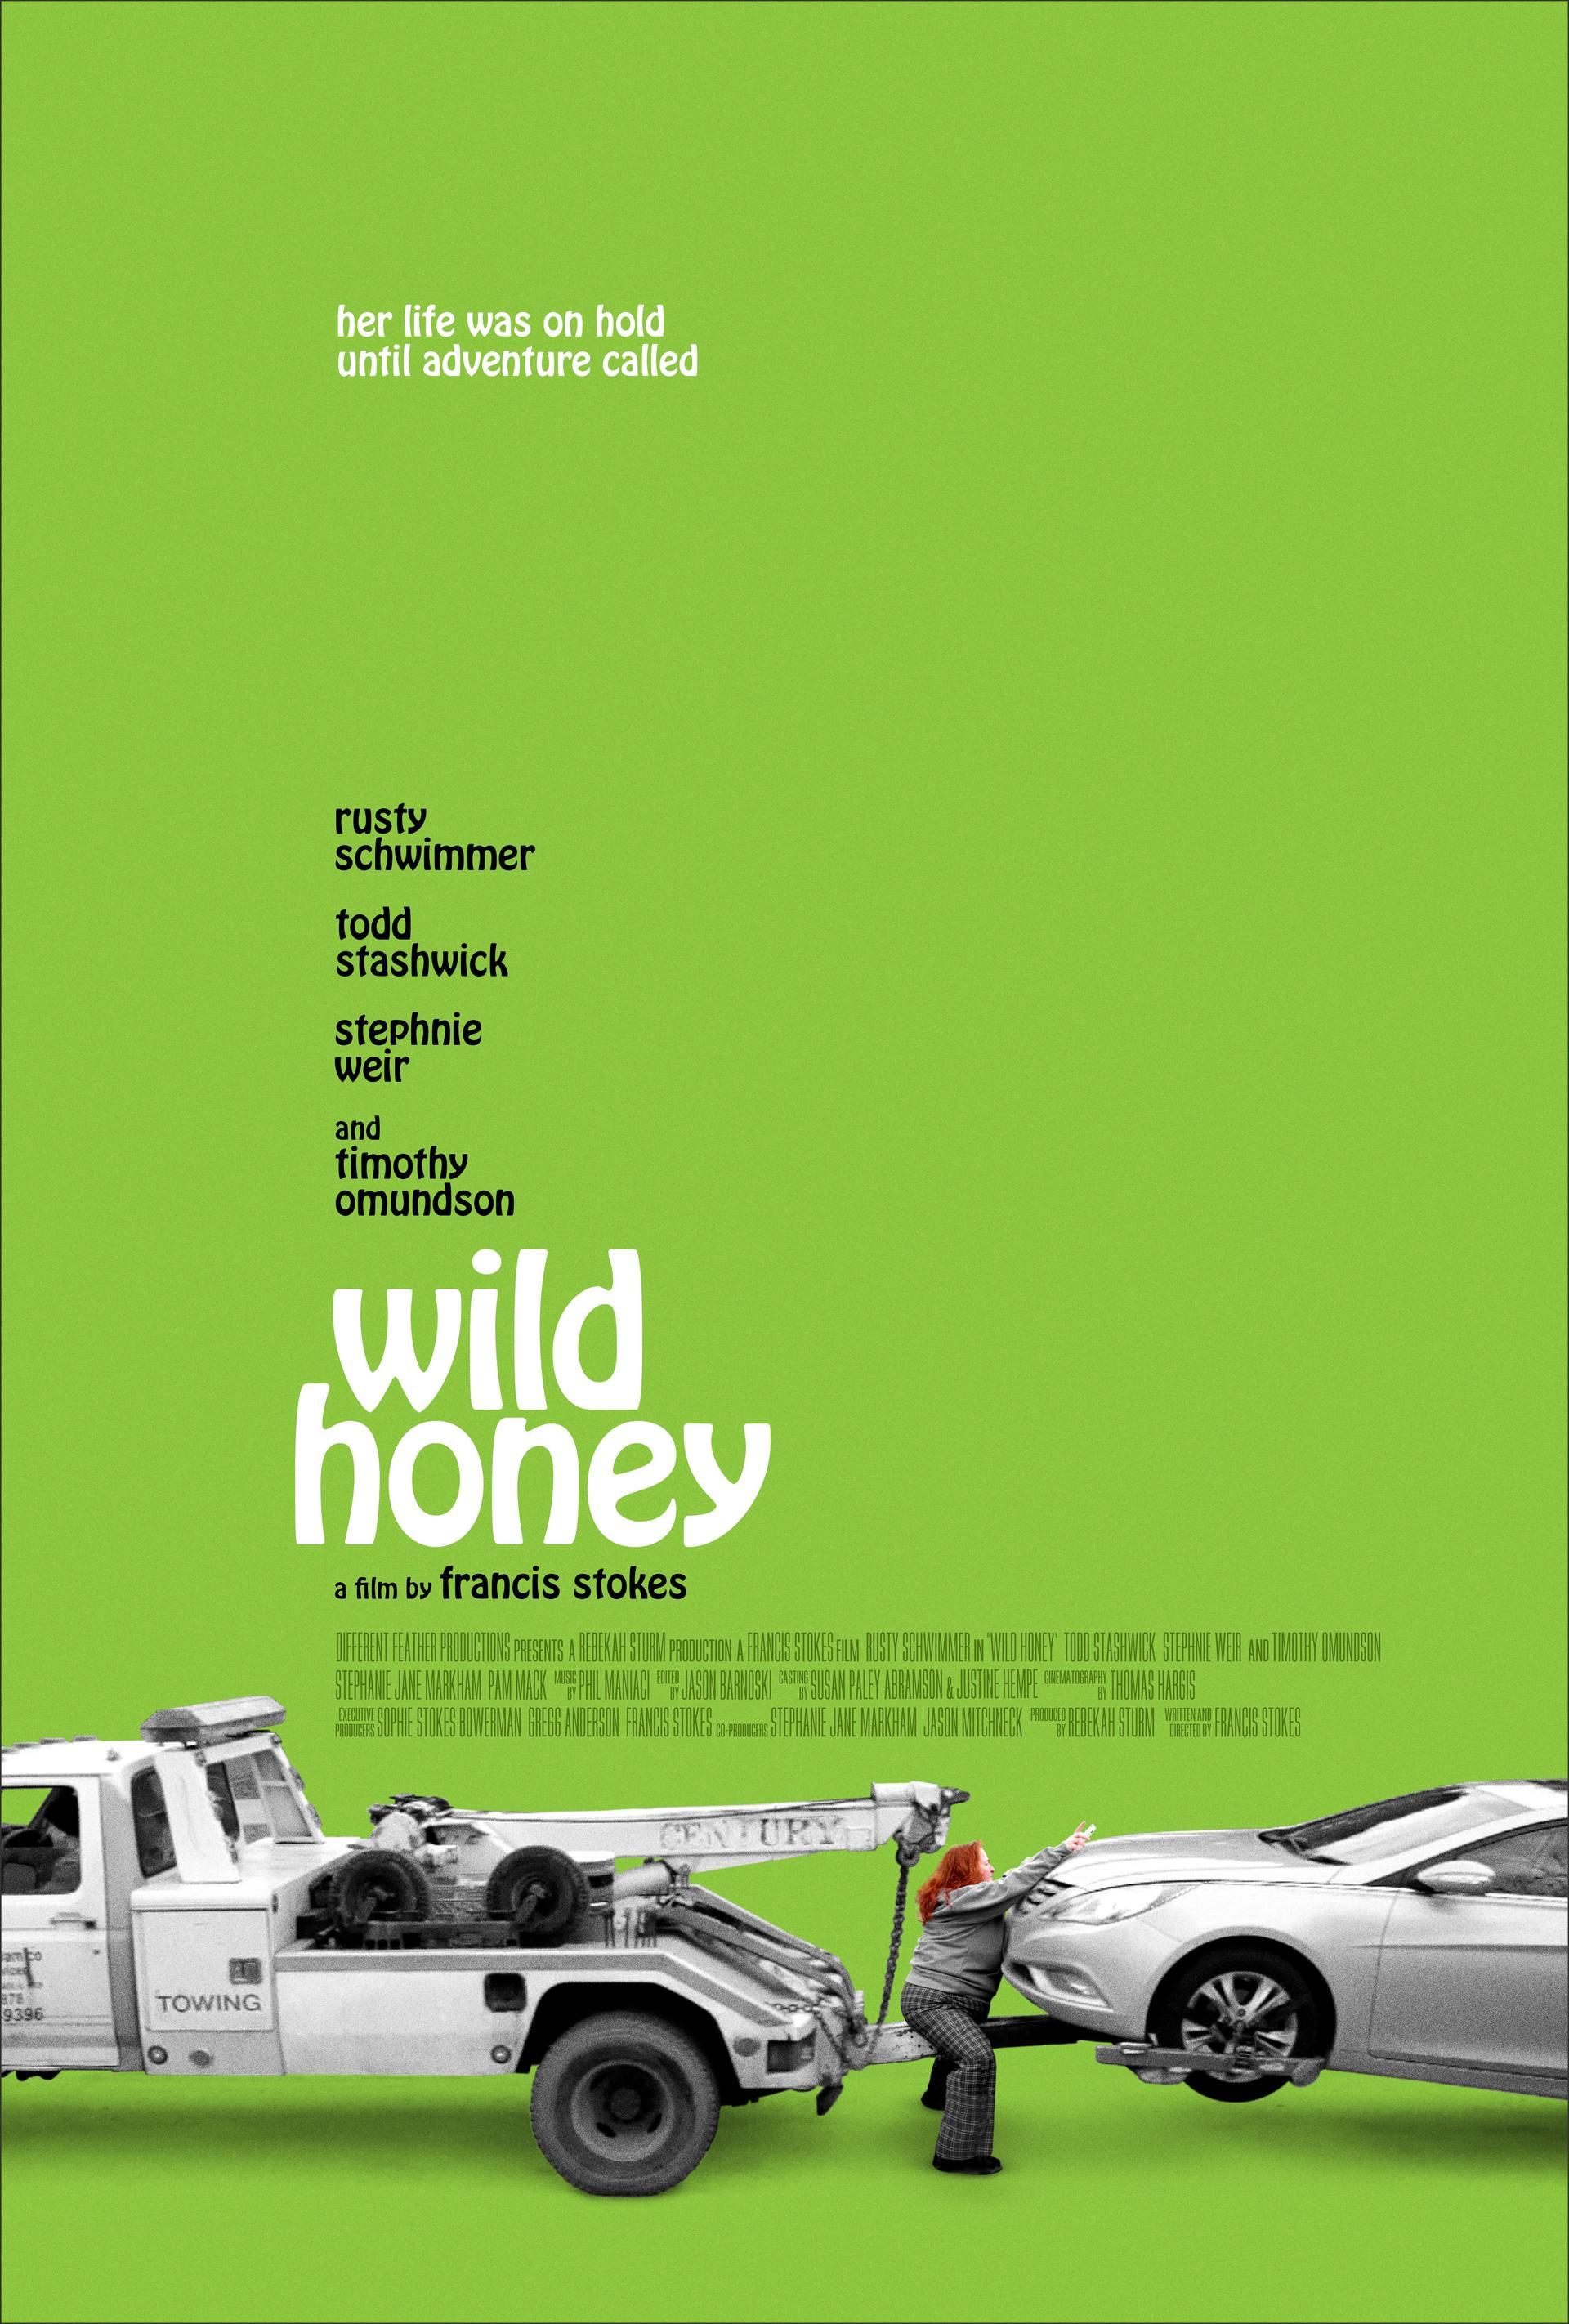 WildHoney_social_Media_Poster.jpg